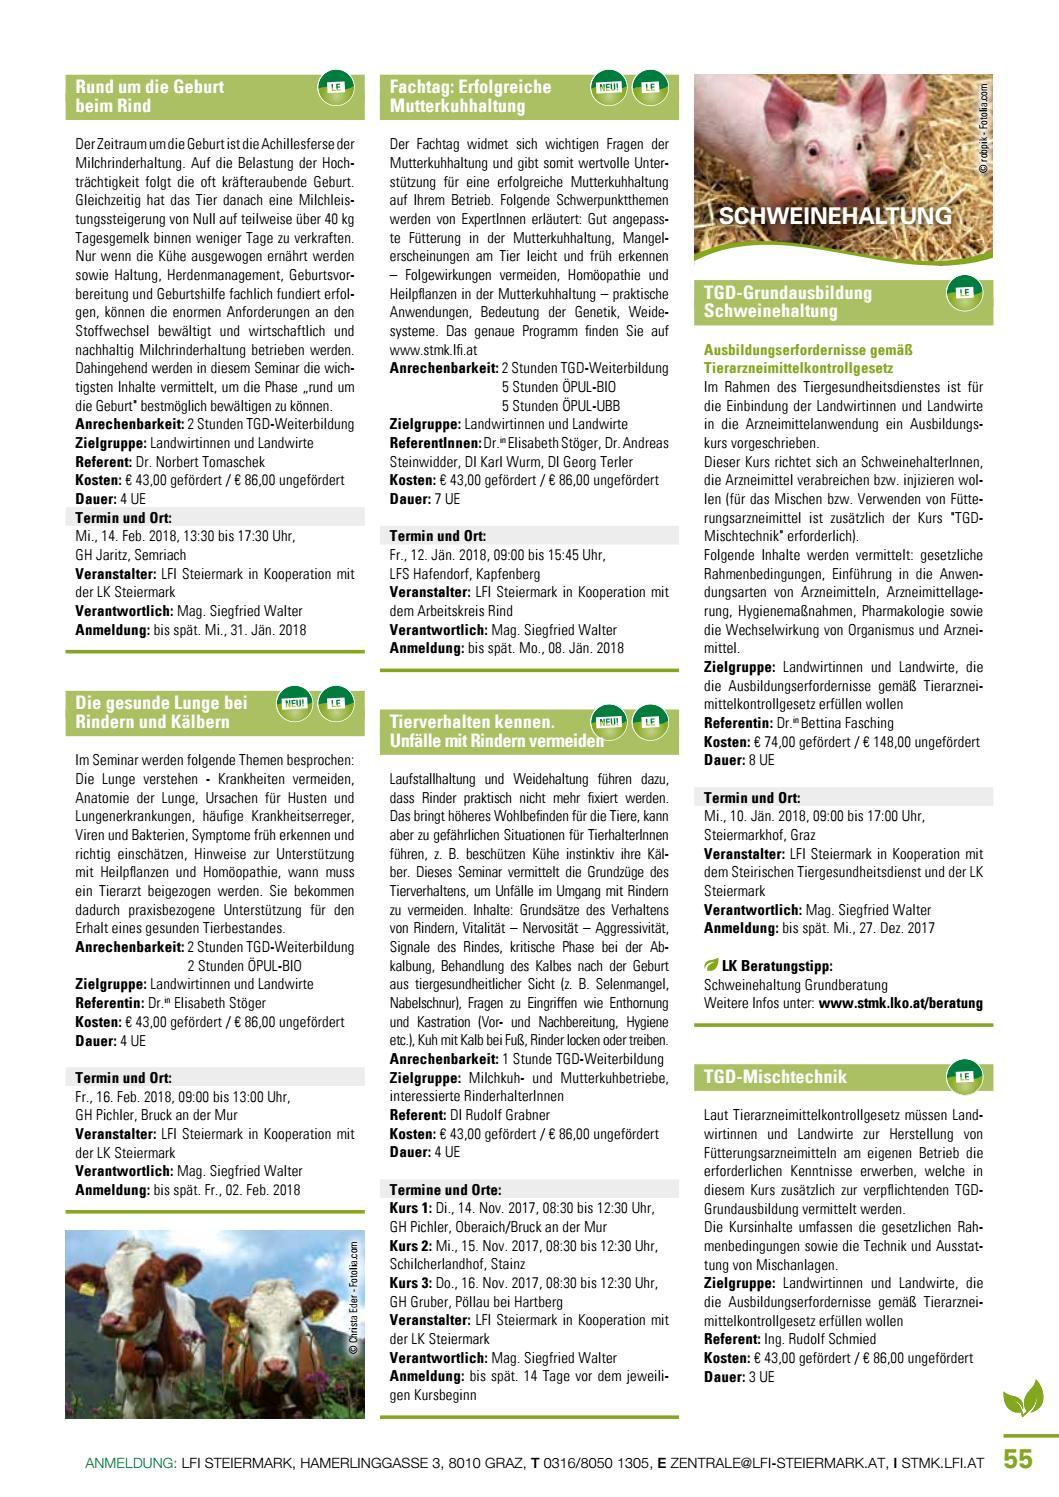 LFI Steiermark Bildungsprogramm 17/18 by LFI Steiermark - issuu